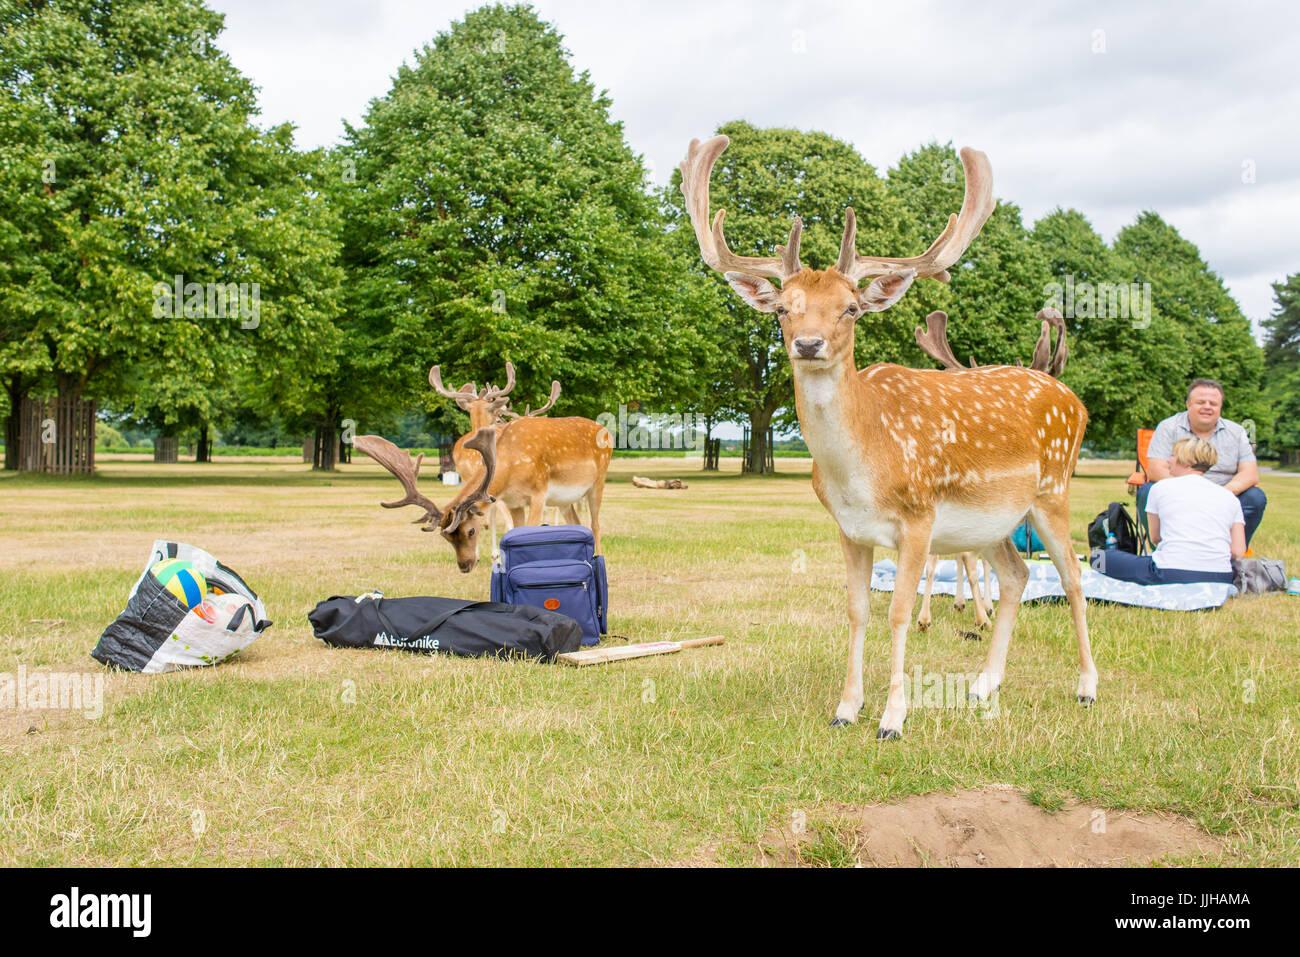 Richmond, London, UK - July 2017: Herd of fallow deer on a grass meadow in Bushy park next to two people having - Stock Image